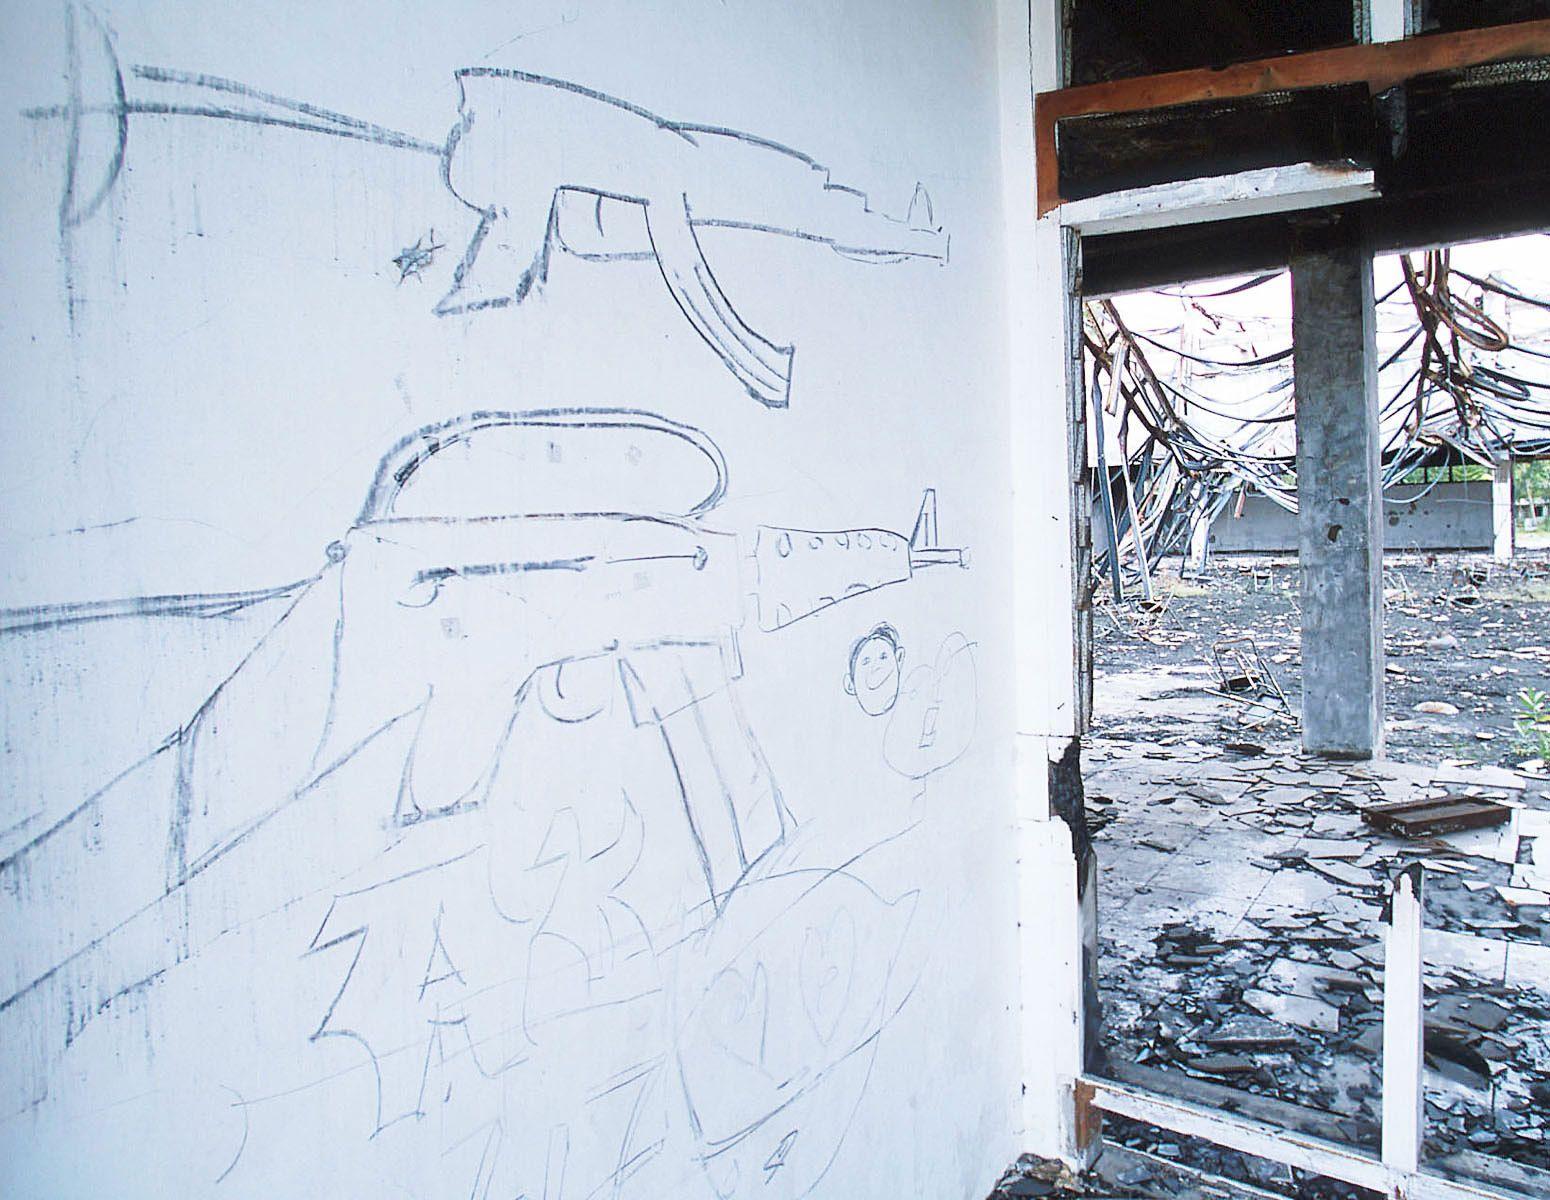 Graffiti on the wall.Syiah Kuala University, Banda Aceh, September 2001